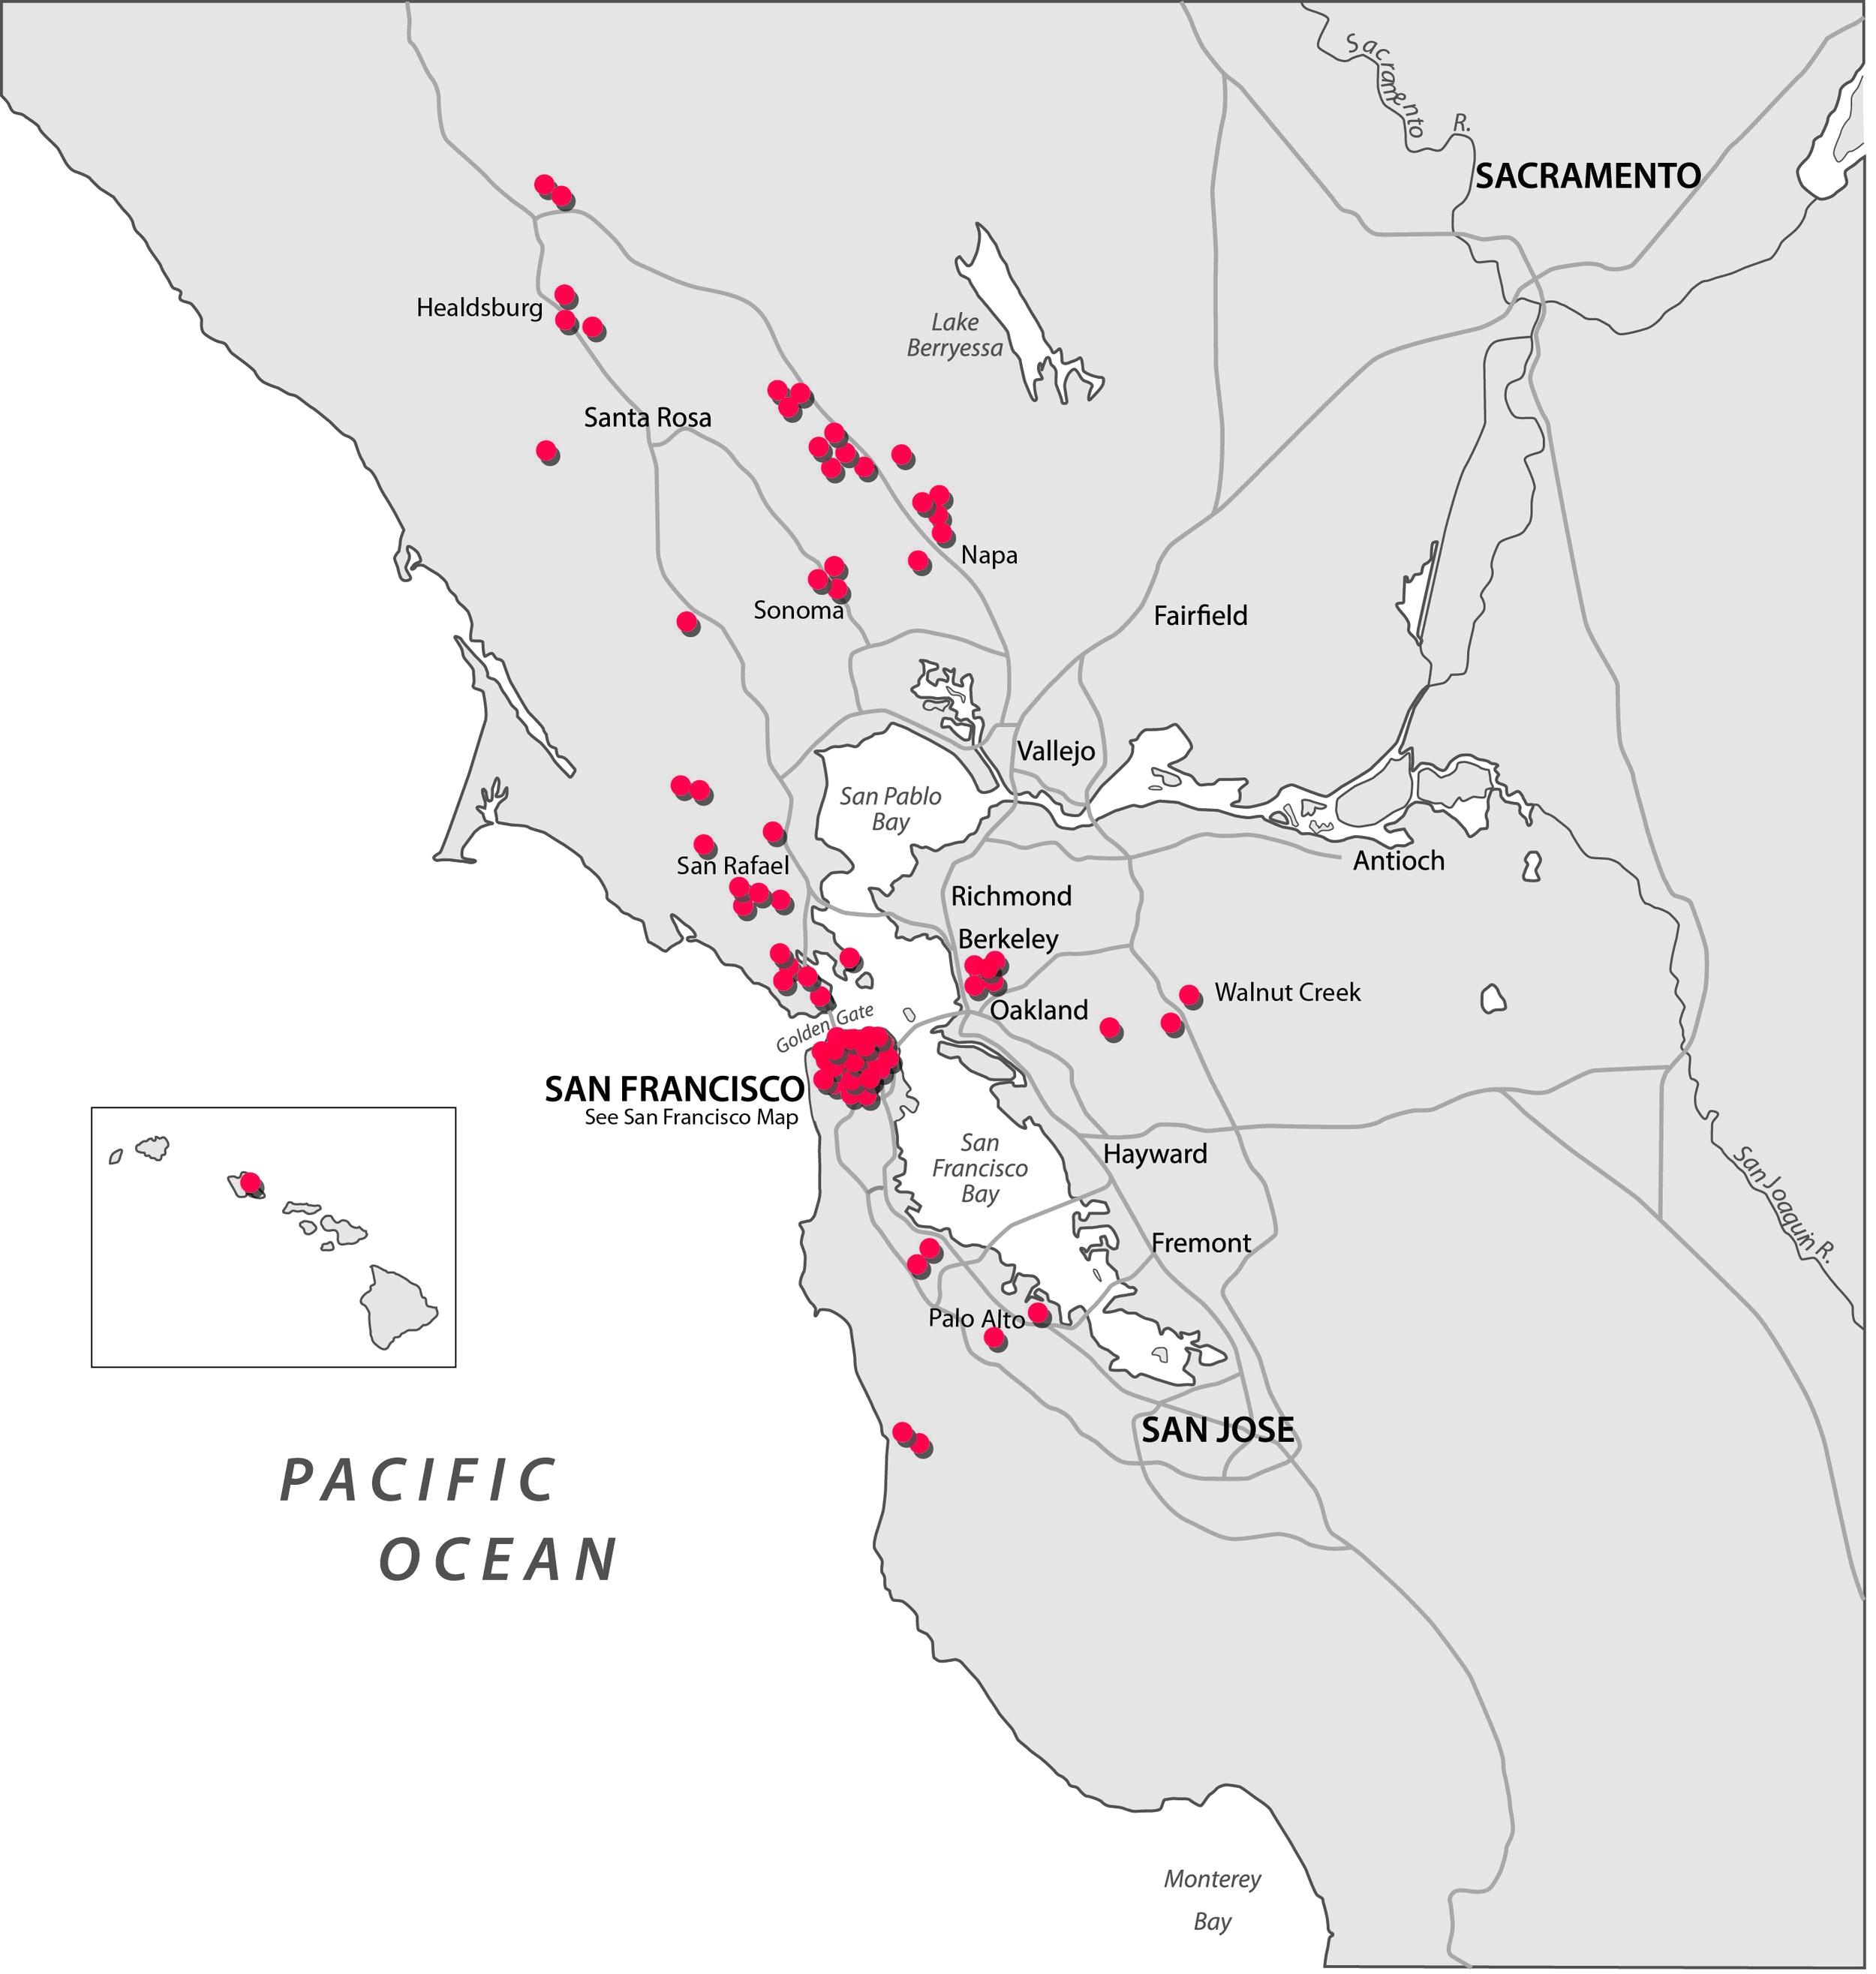 GA+Regional+Project+Map+May+2019.jpg